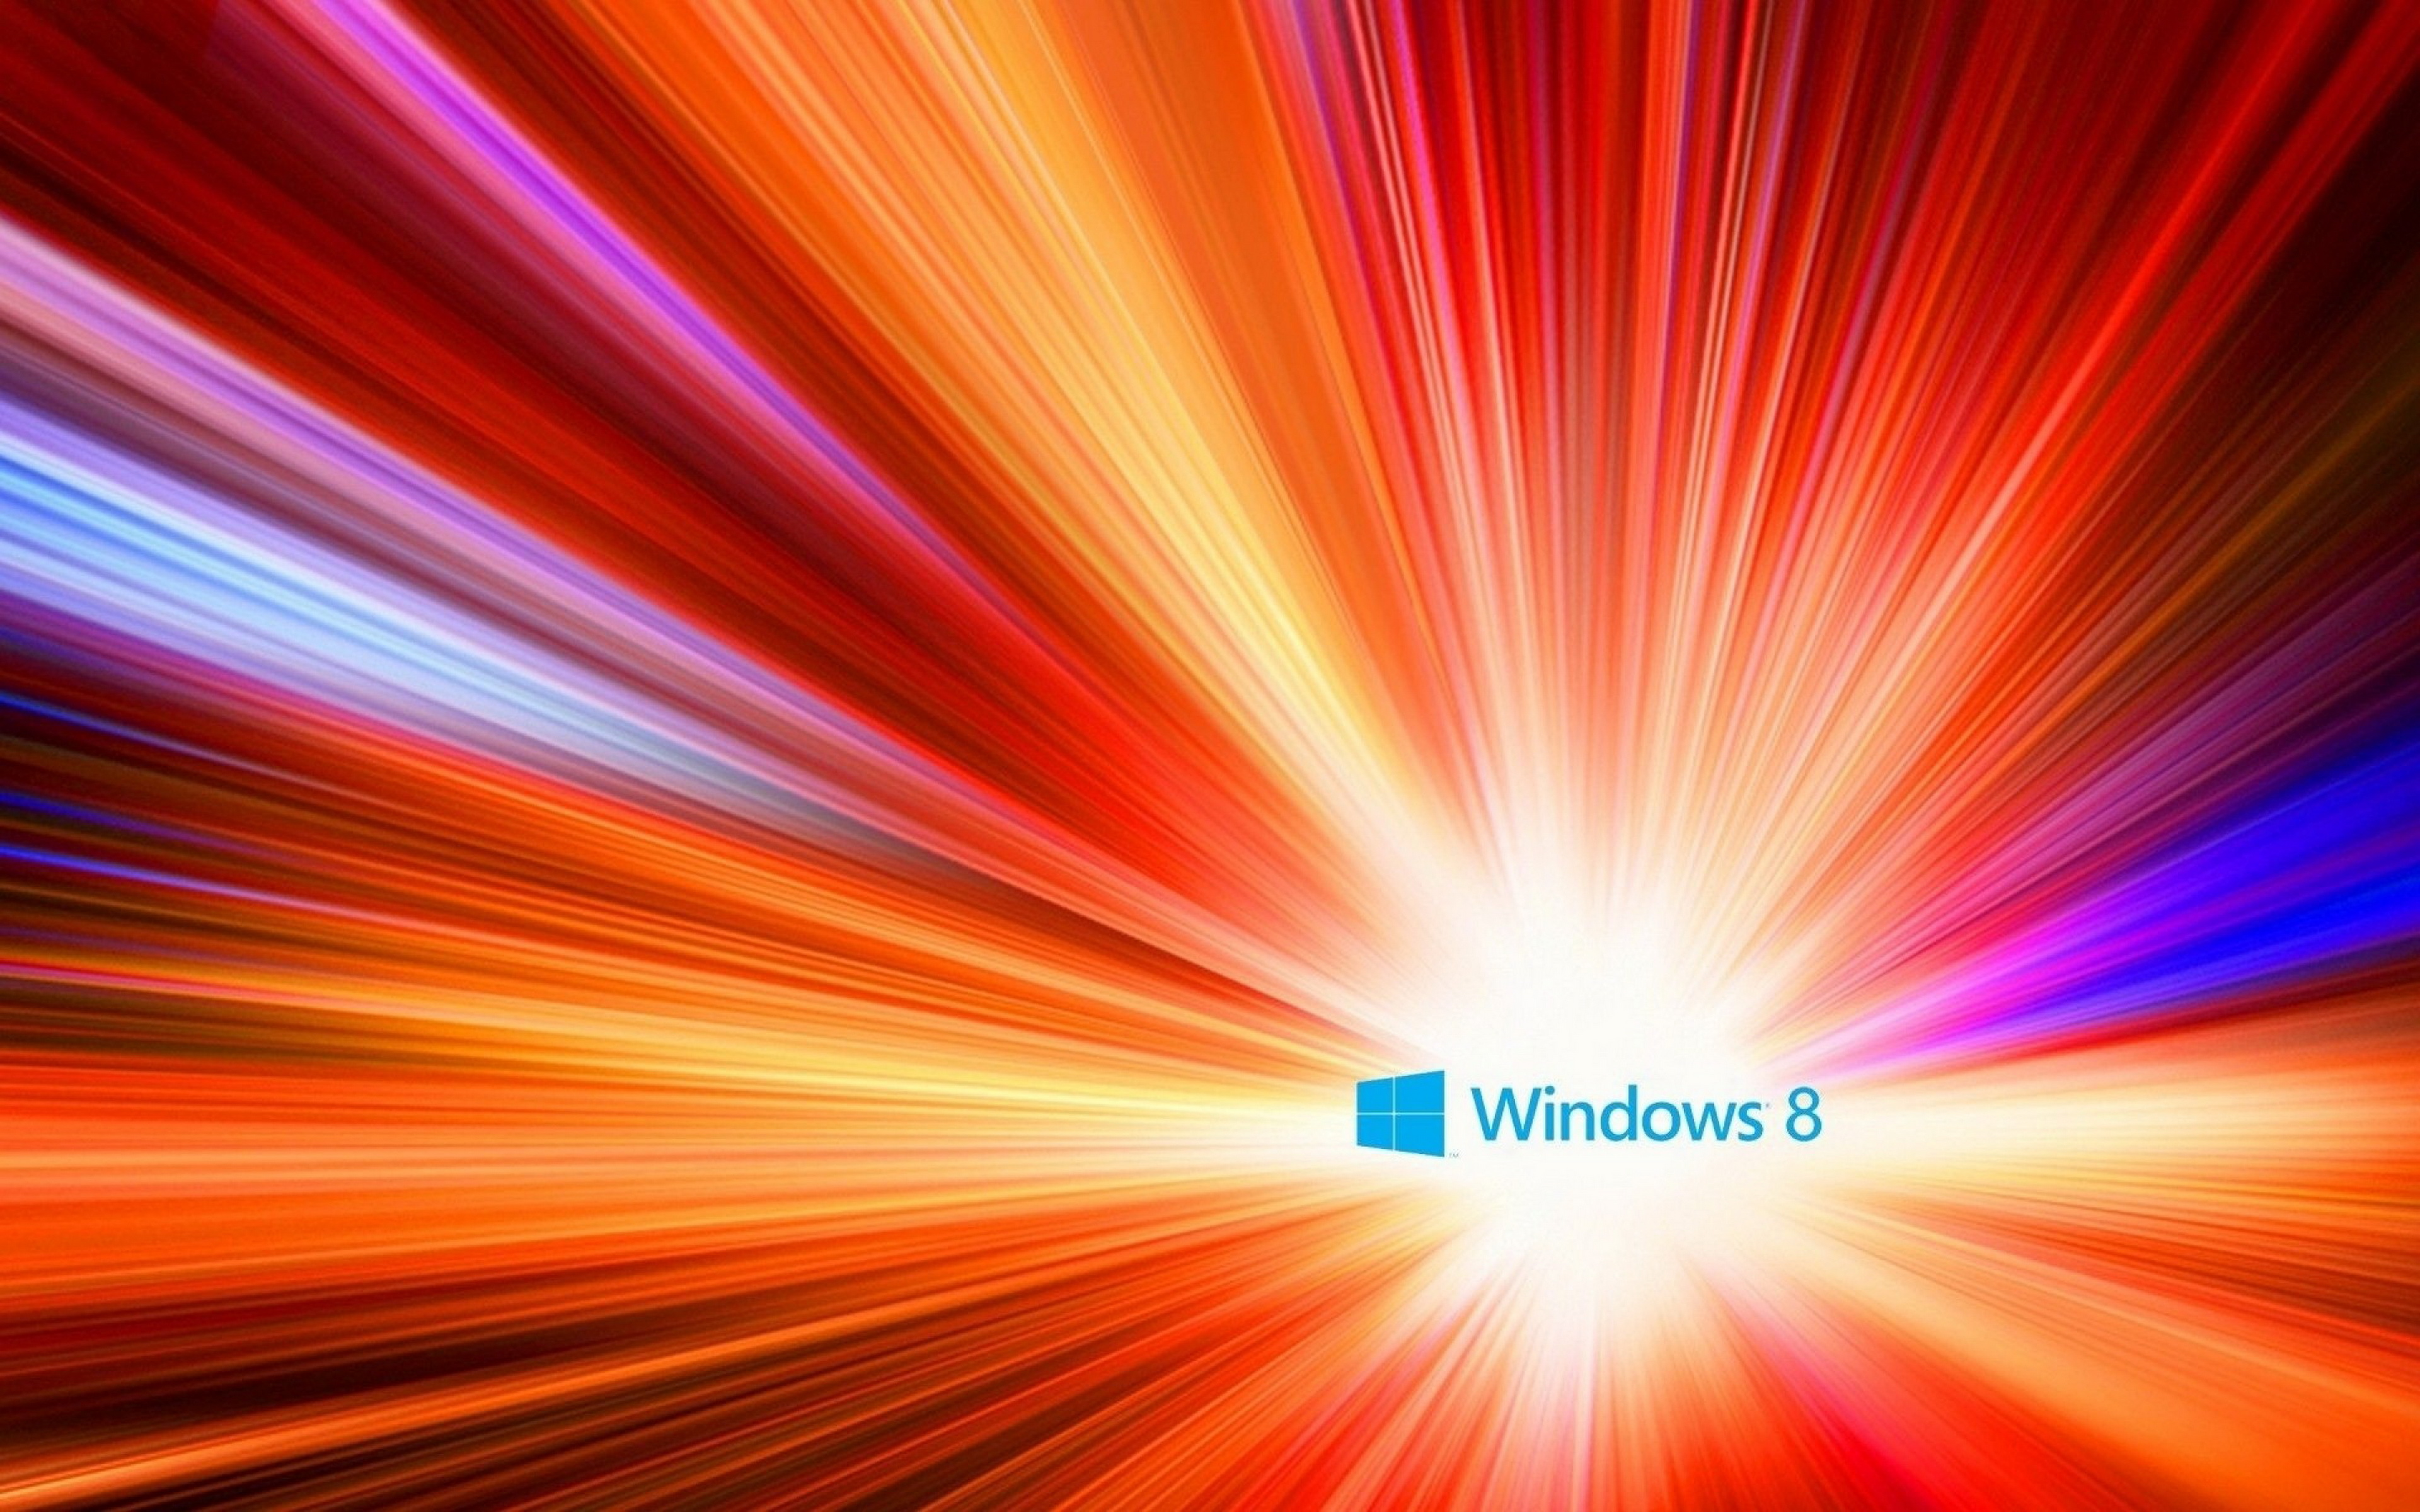 Windows 8 4k Ultra Fondo De Pantalla Hd Fondo De